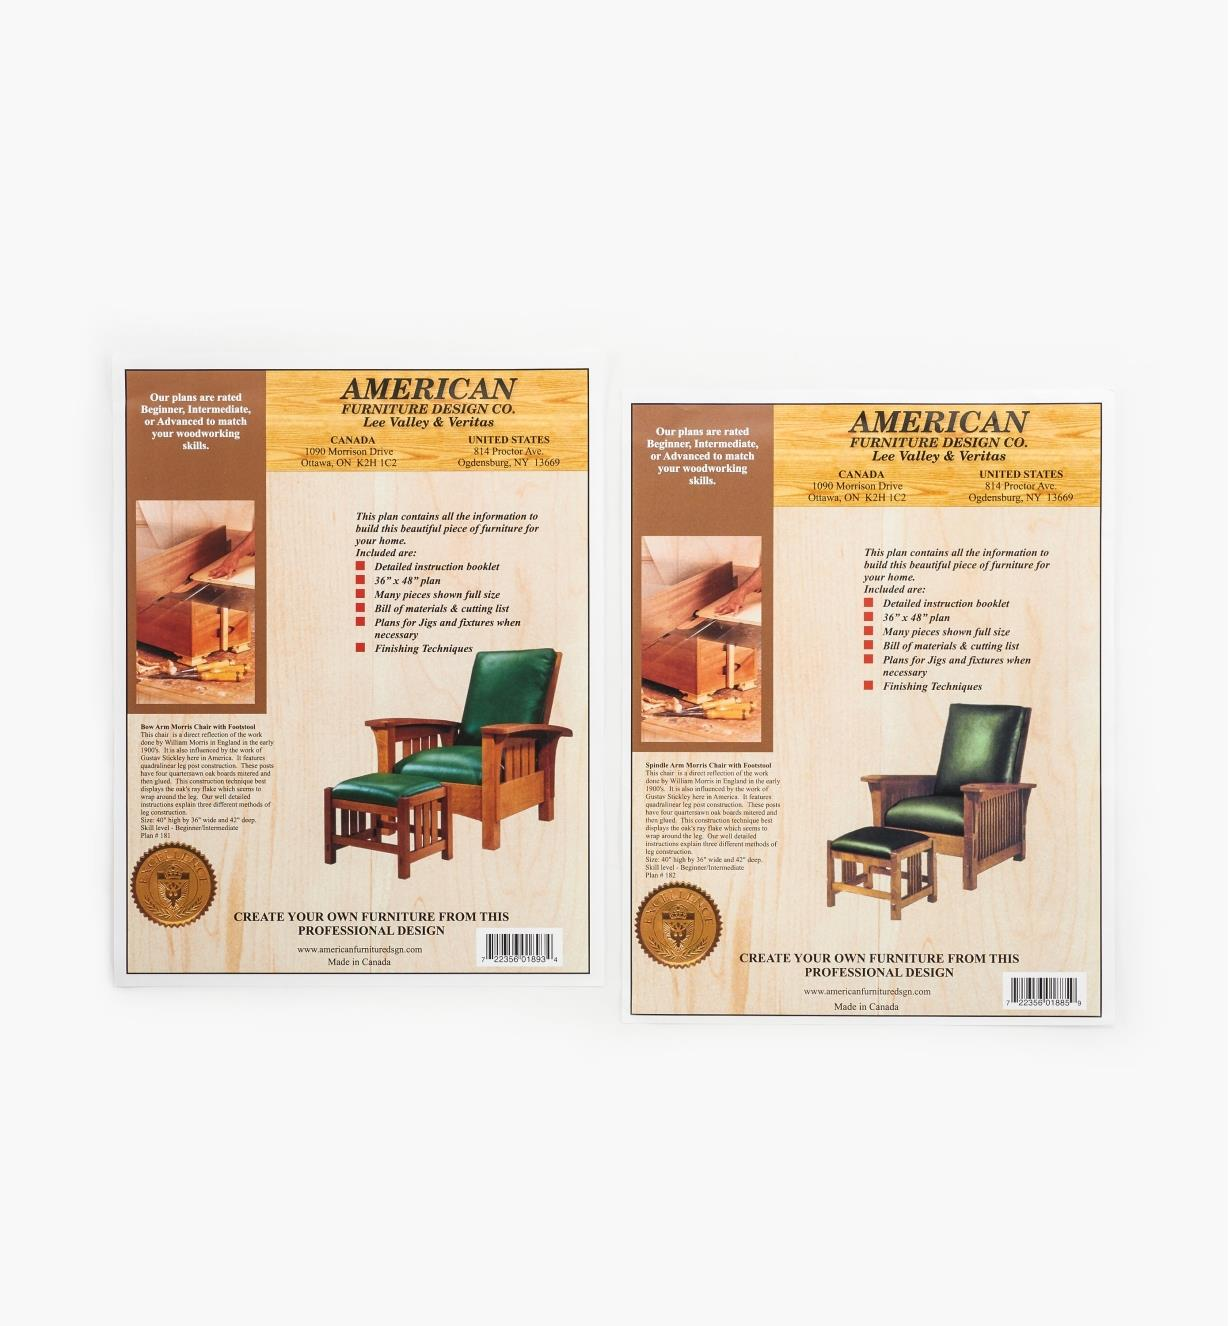 01L5074 - Morris Chair & Footstool Plans Combo